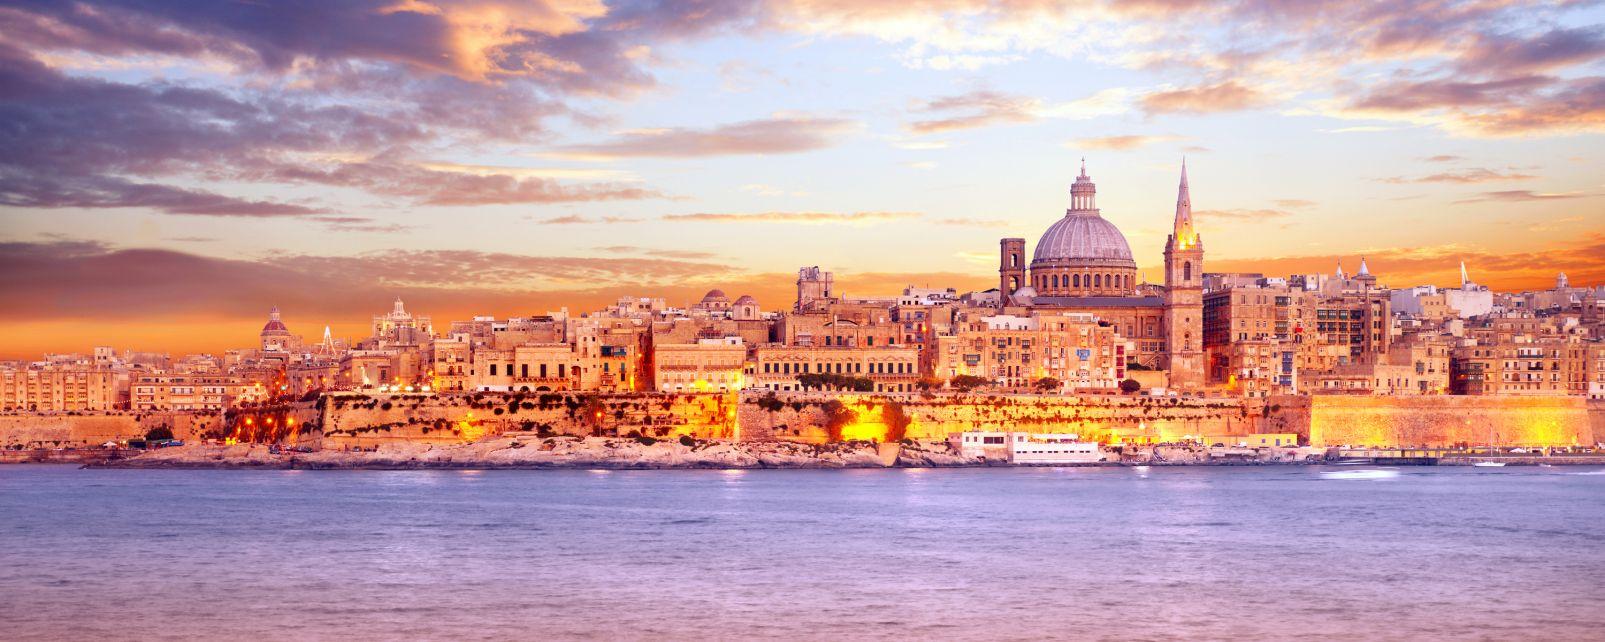 Europe, Malte, La Valette, ville, église, mer, architecture,